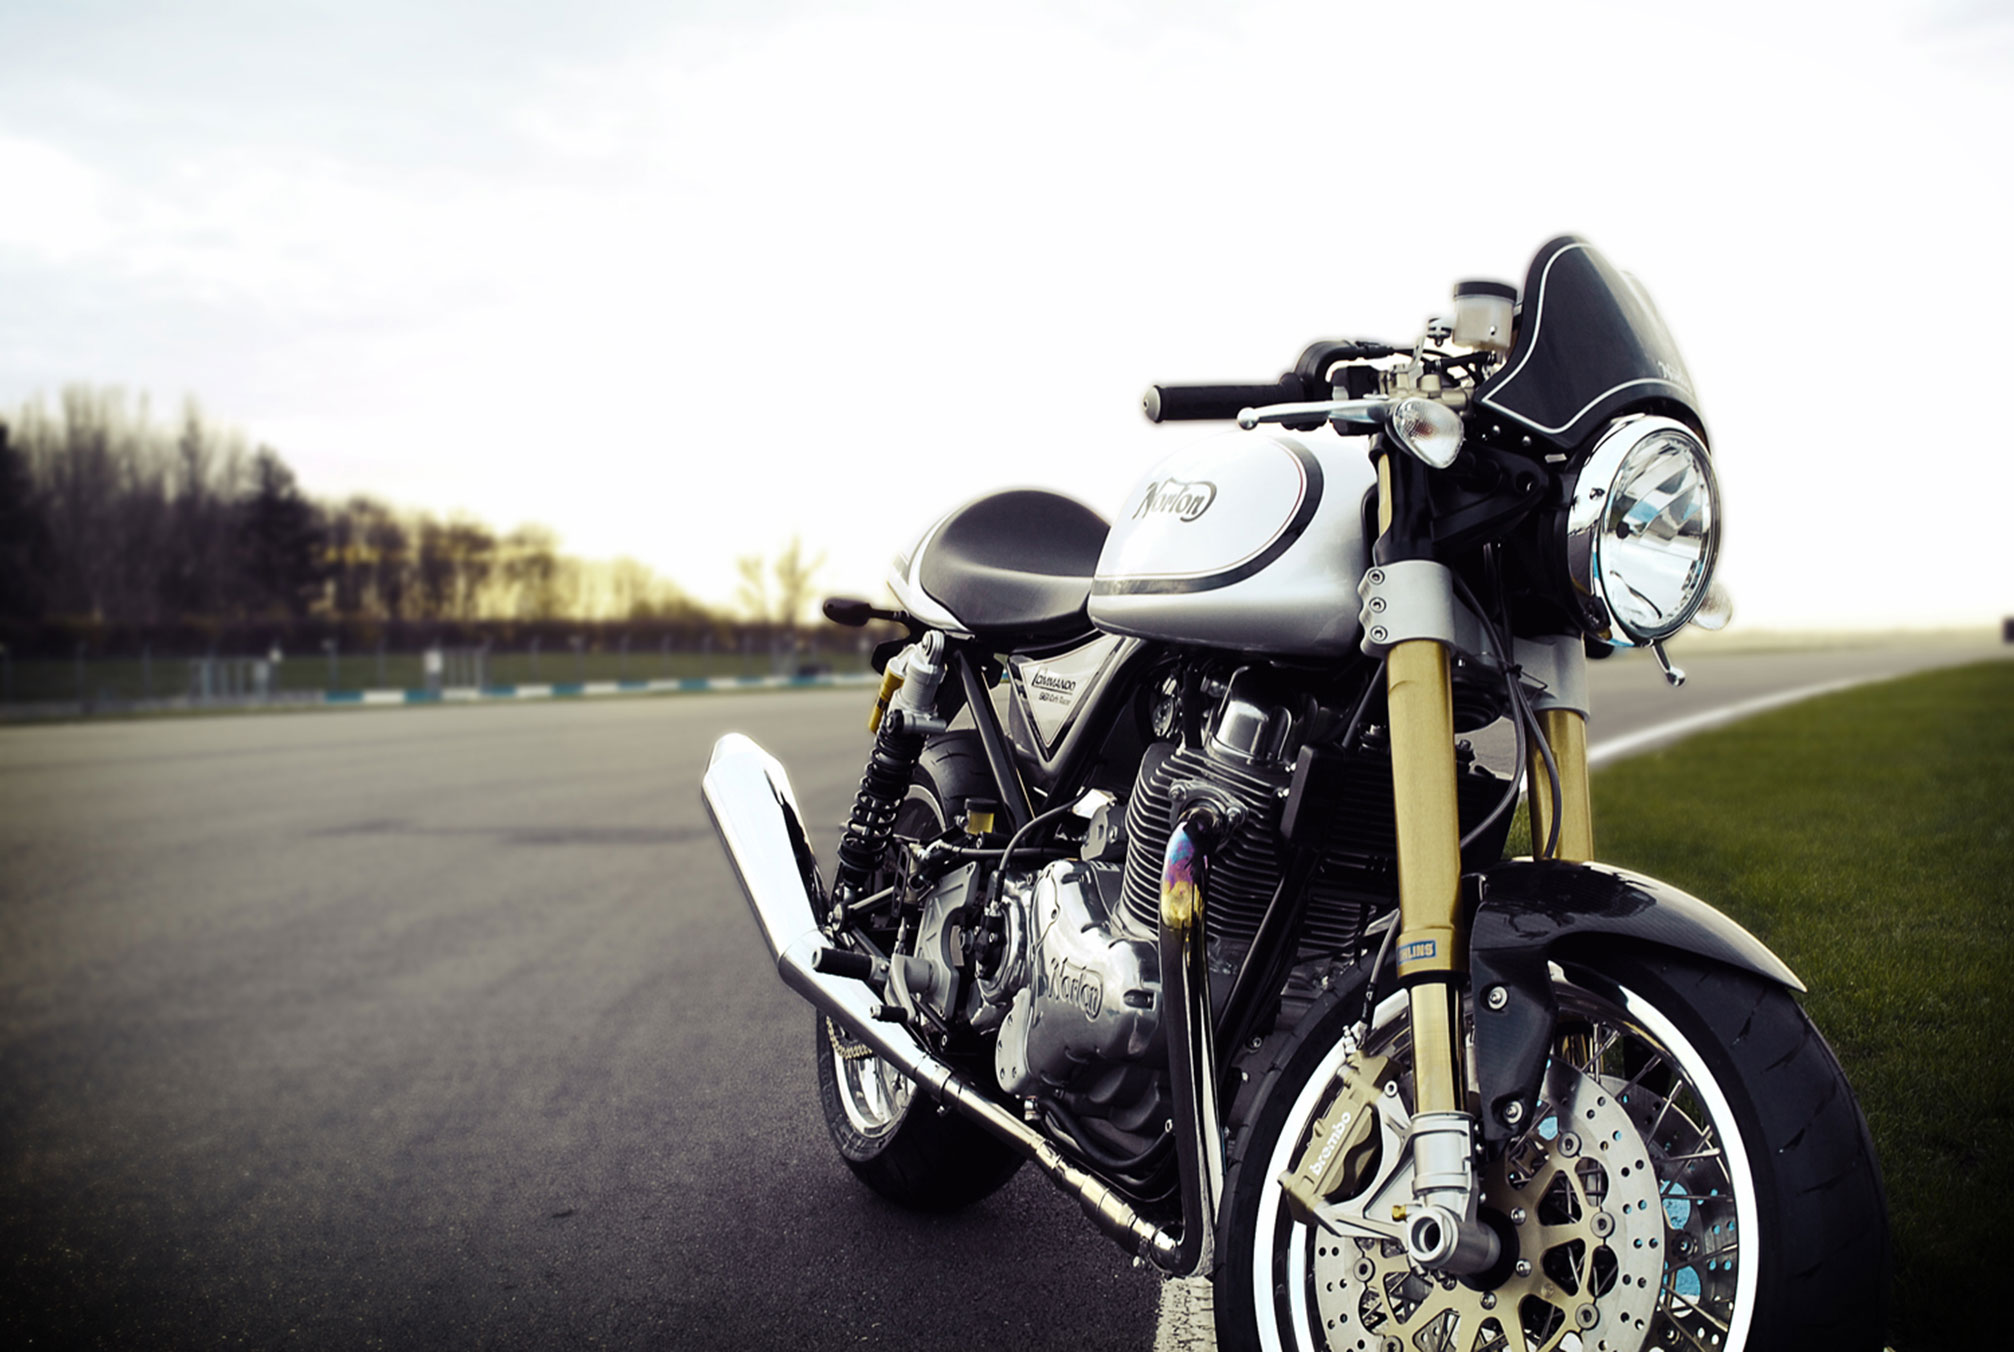 2014-Norton-Commando-961-Cafe-Racer2